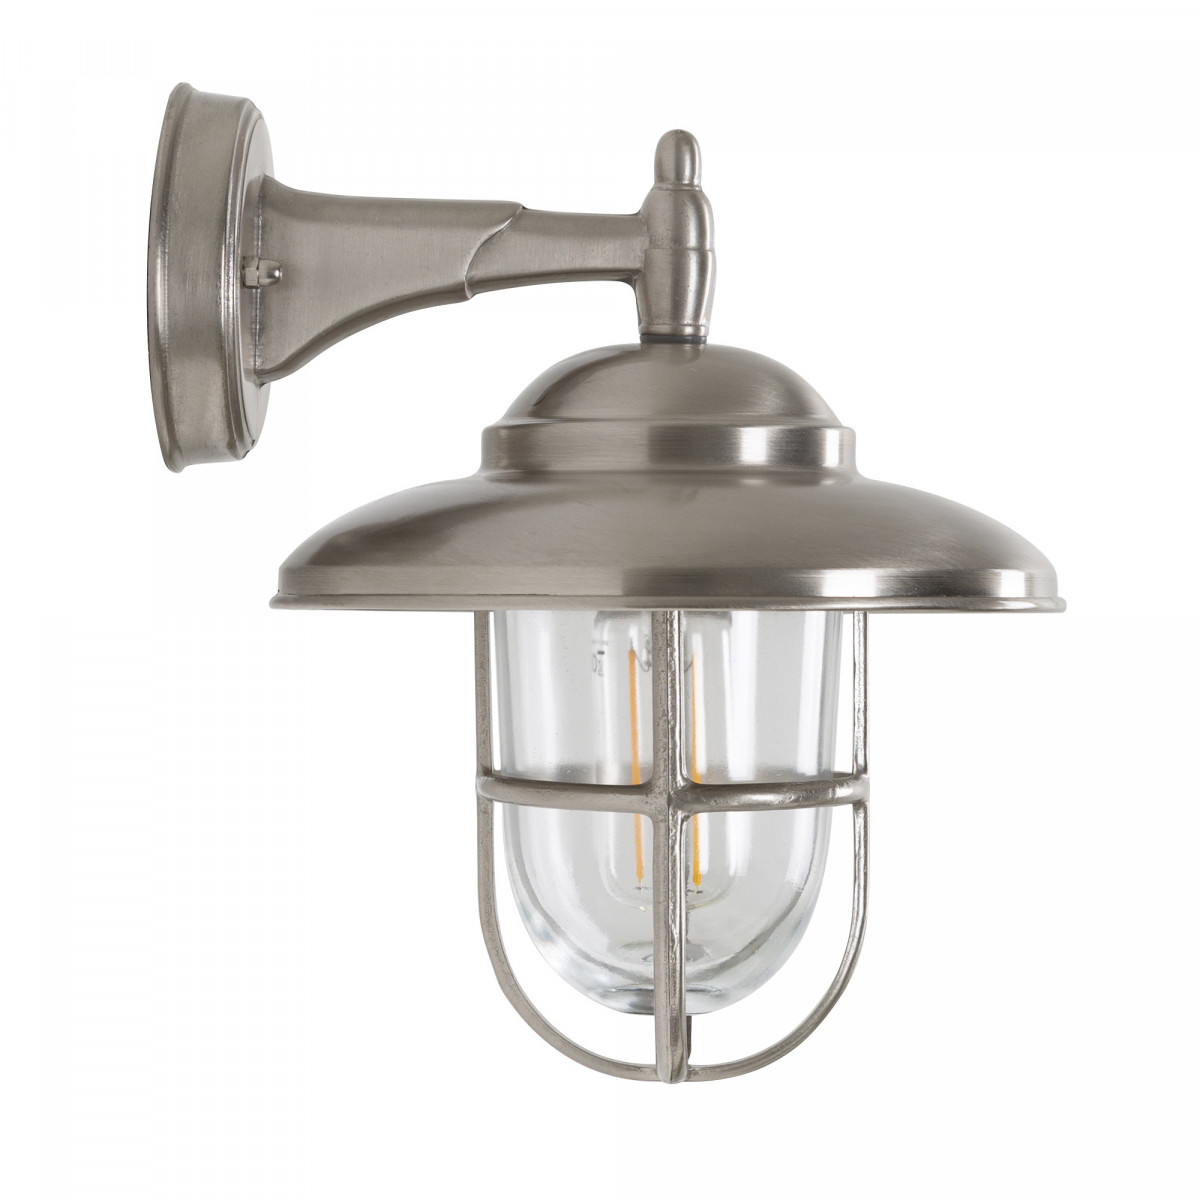 Monte (7707) - KS Verlichting - Buitenverlichting wandlamp nikkel